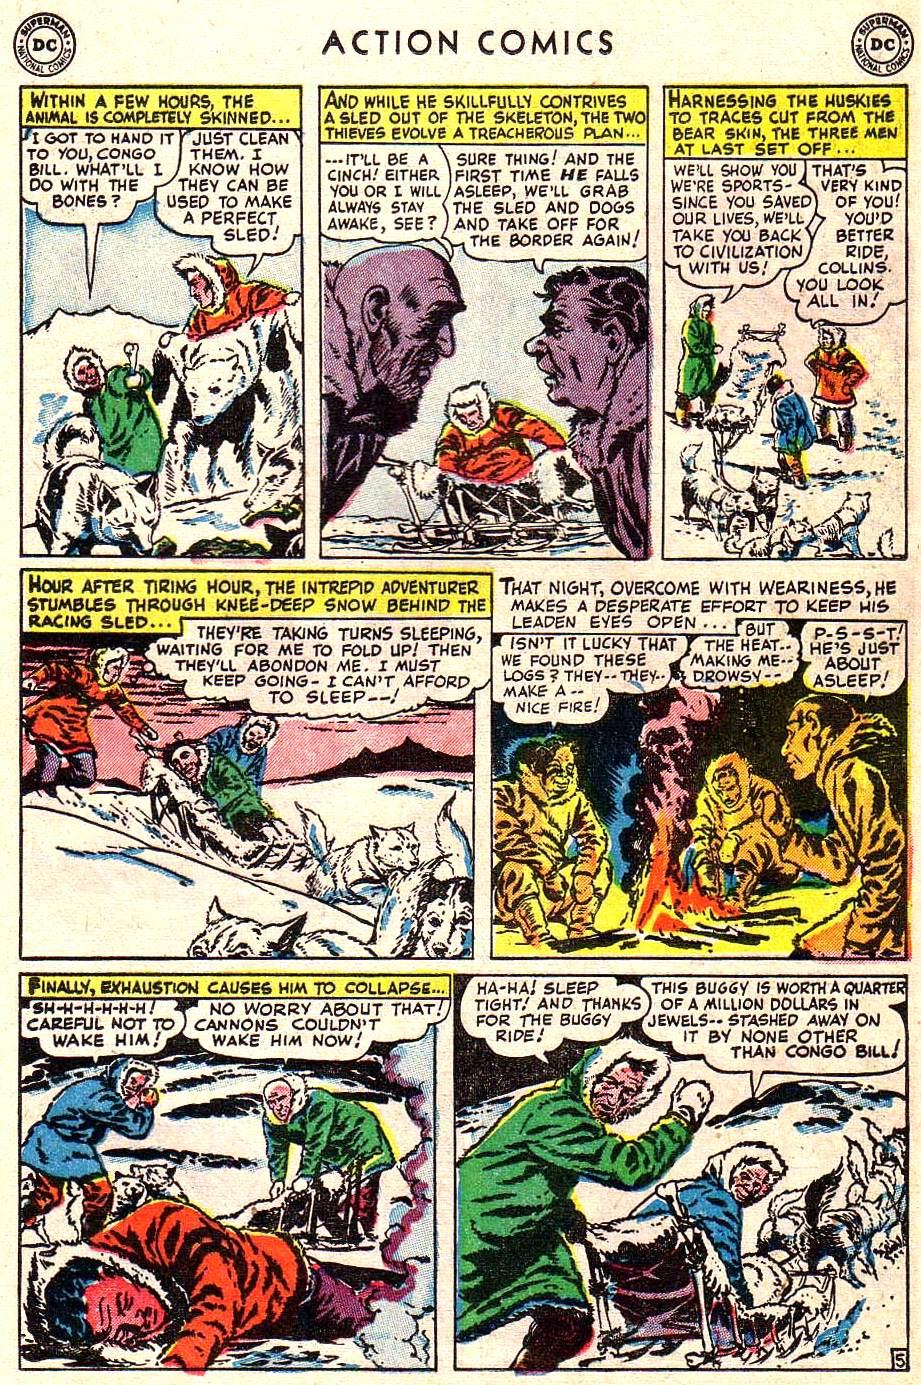 Action Comics (1938) 172 Page 20